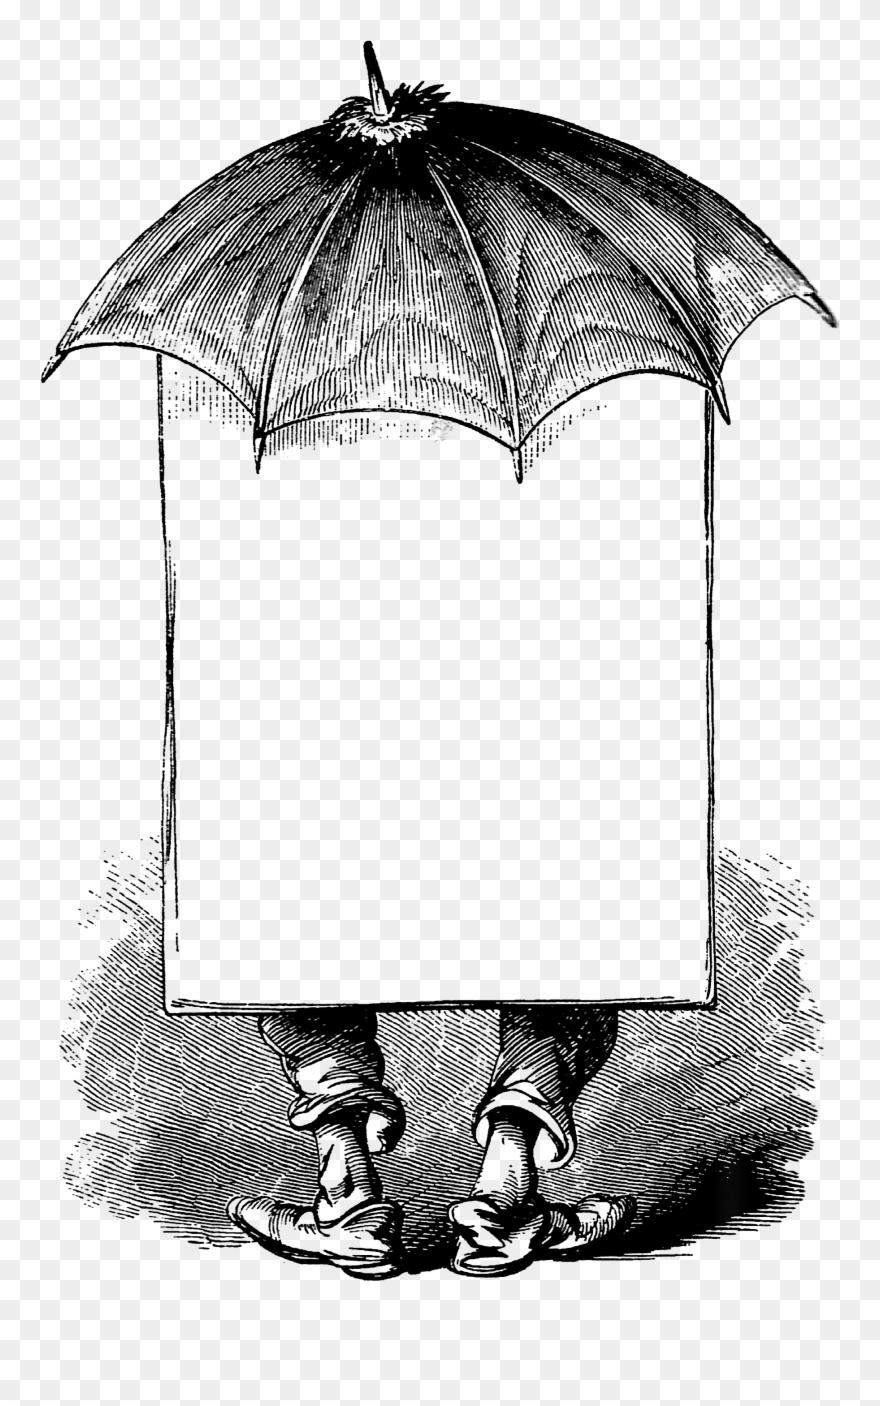 medium resolution of 0255 victorian man umbrella advertising blank banner idioms in his sauce beltr n mar a